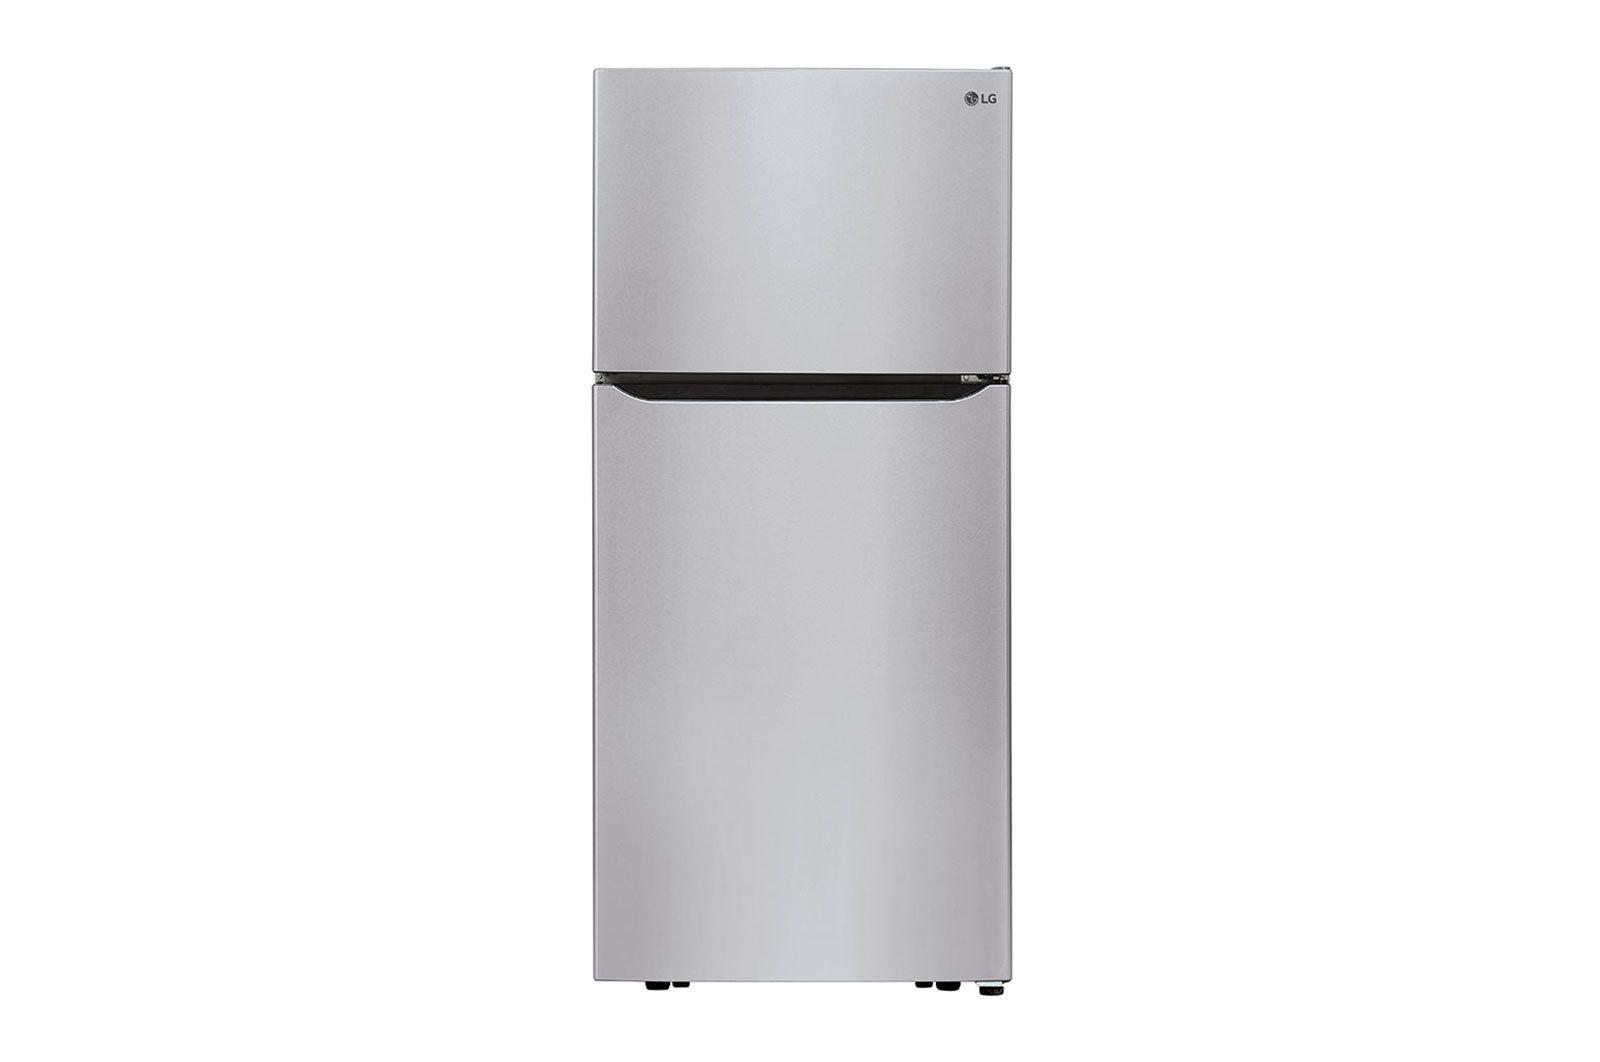 LG LTCS20020S 20 cu. ft. Top Freezer Refrigerator